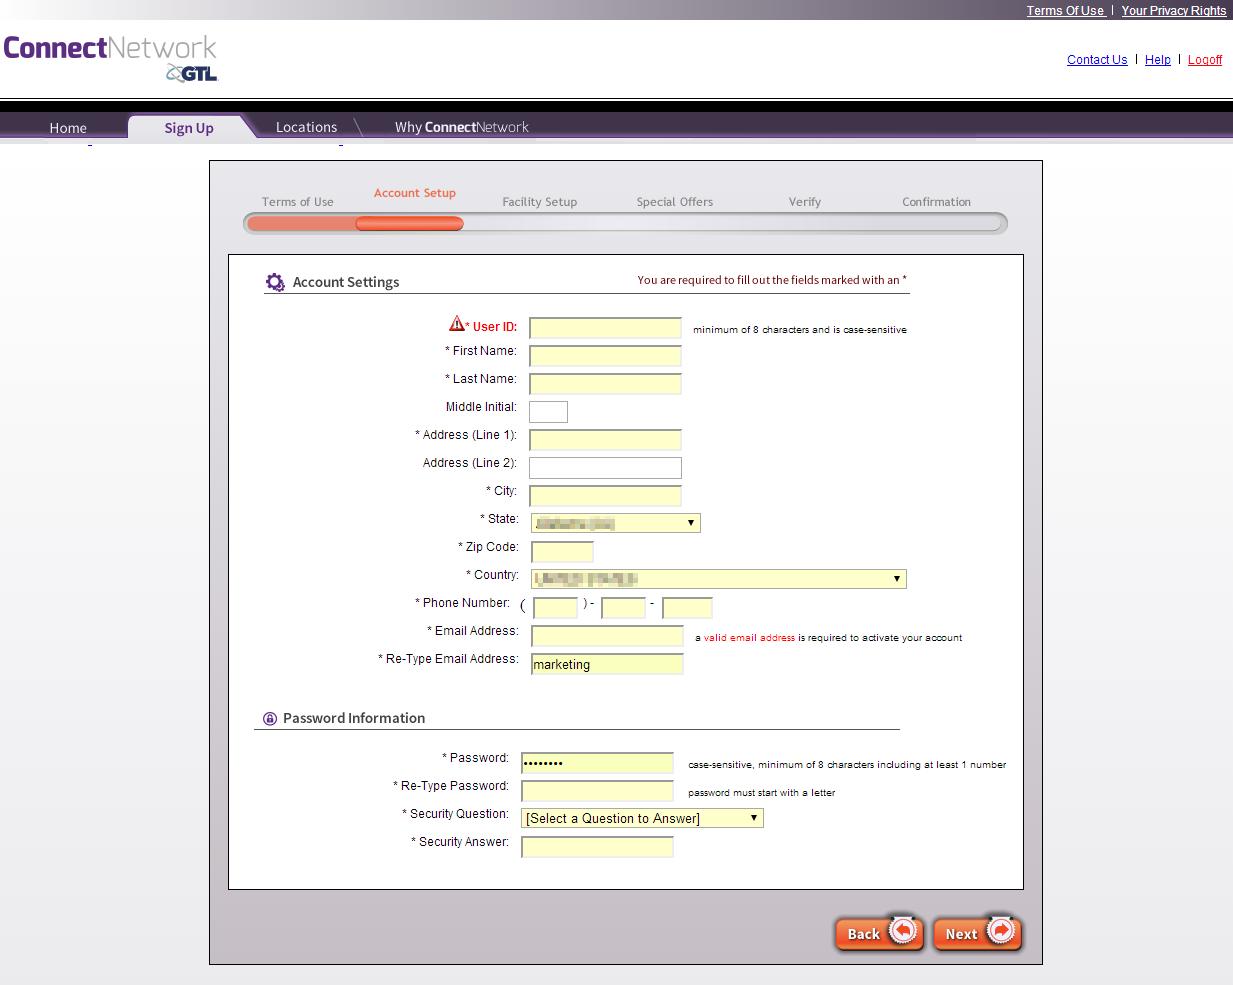 ConnectNetwork com Account Management Instructions – PIN